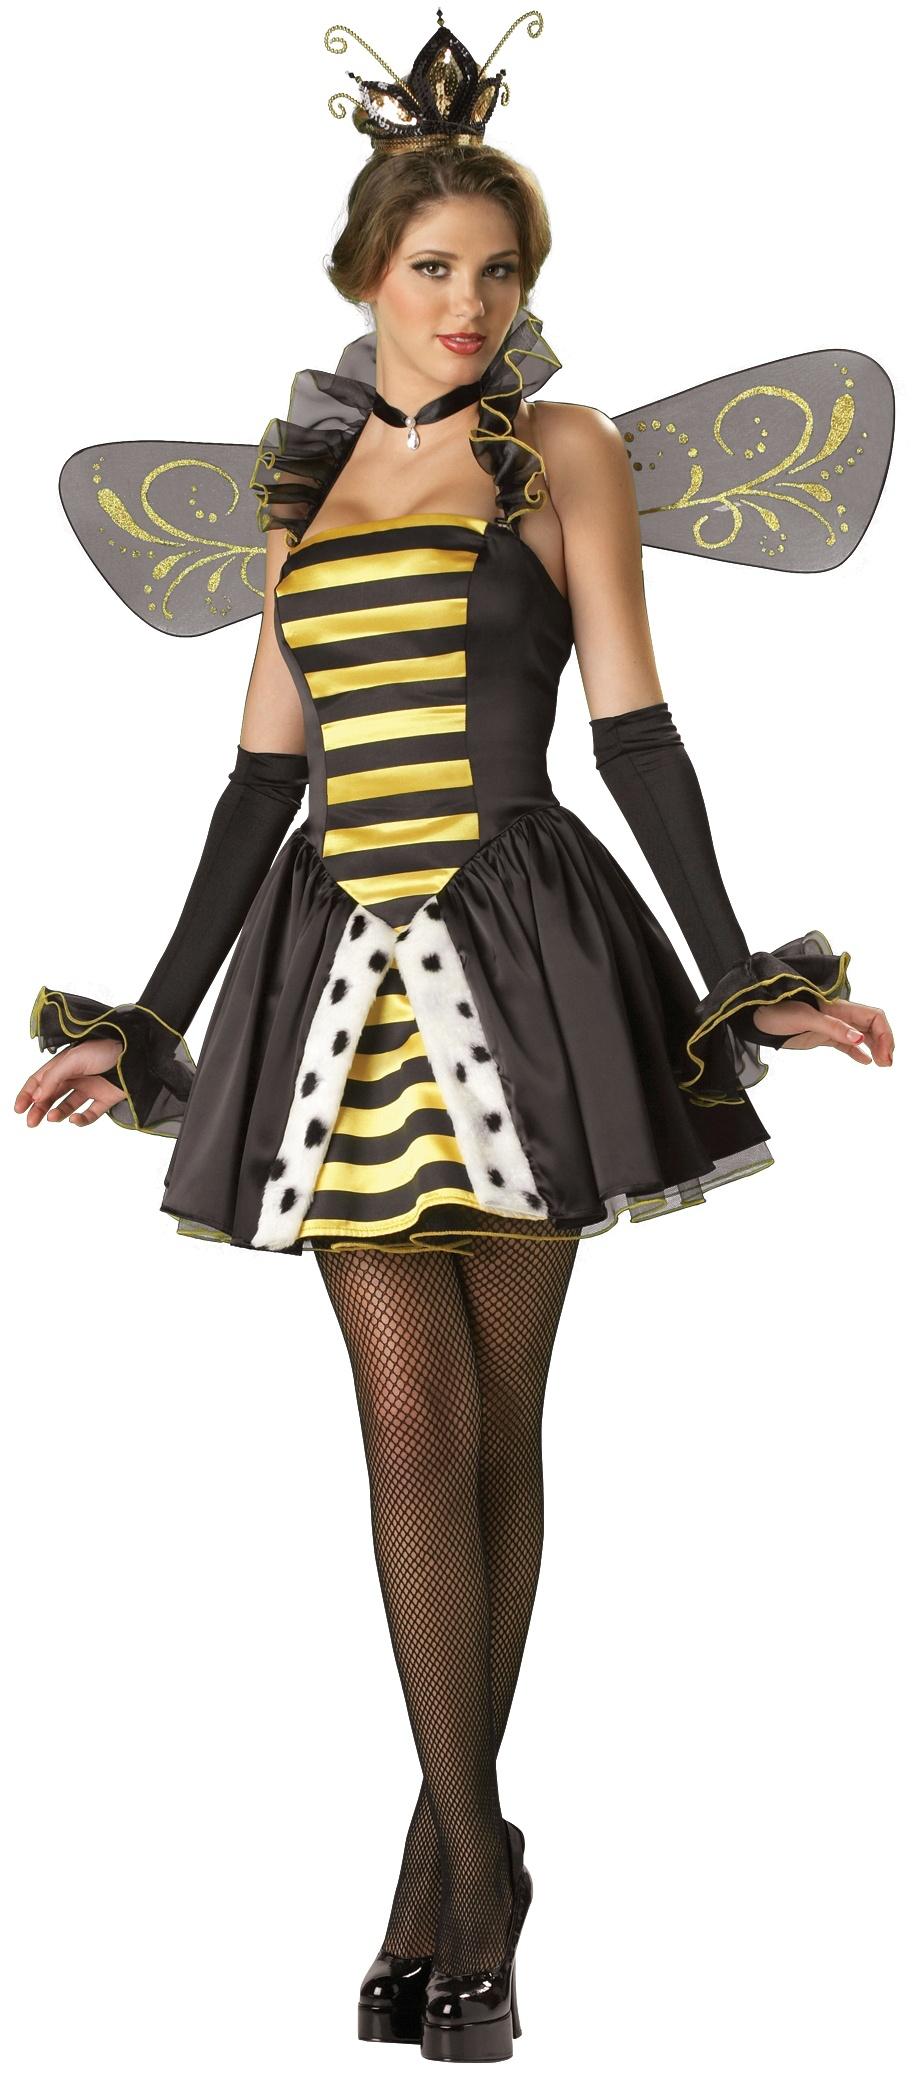 Bee Costume Adult 51